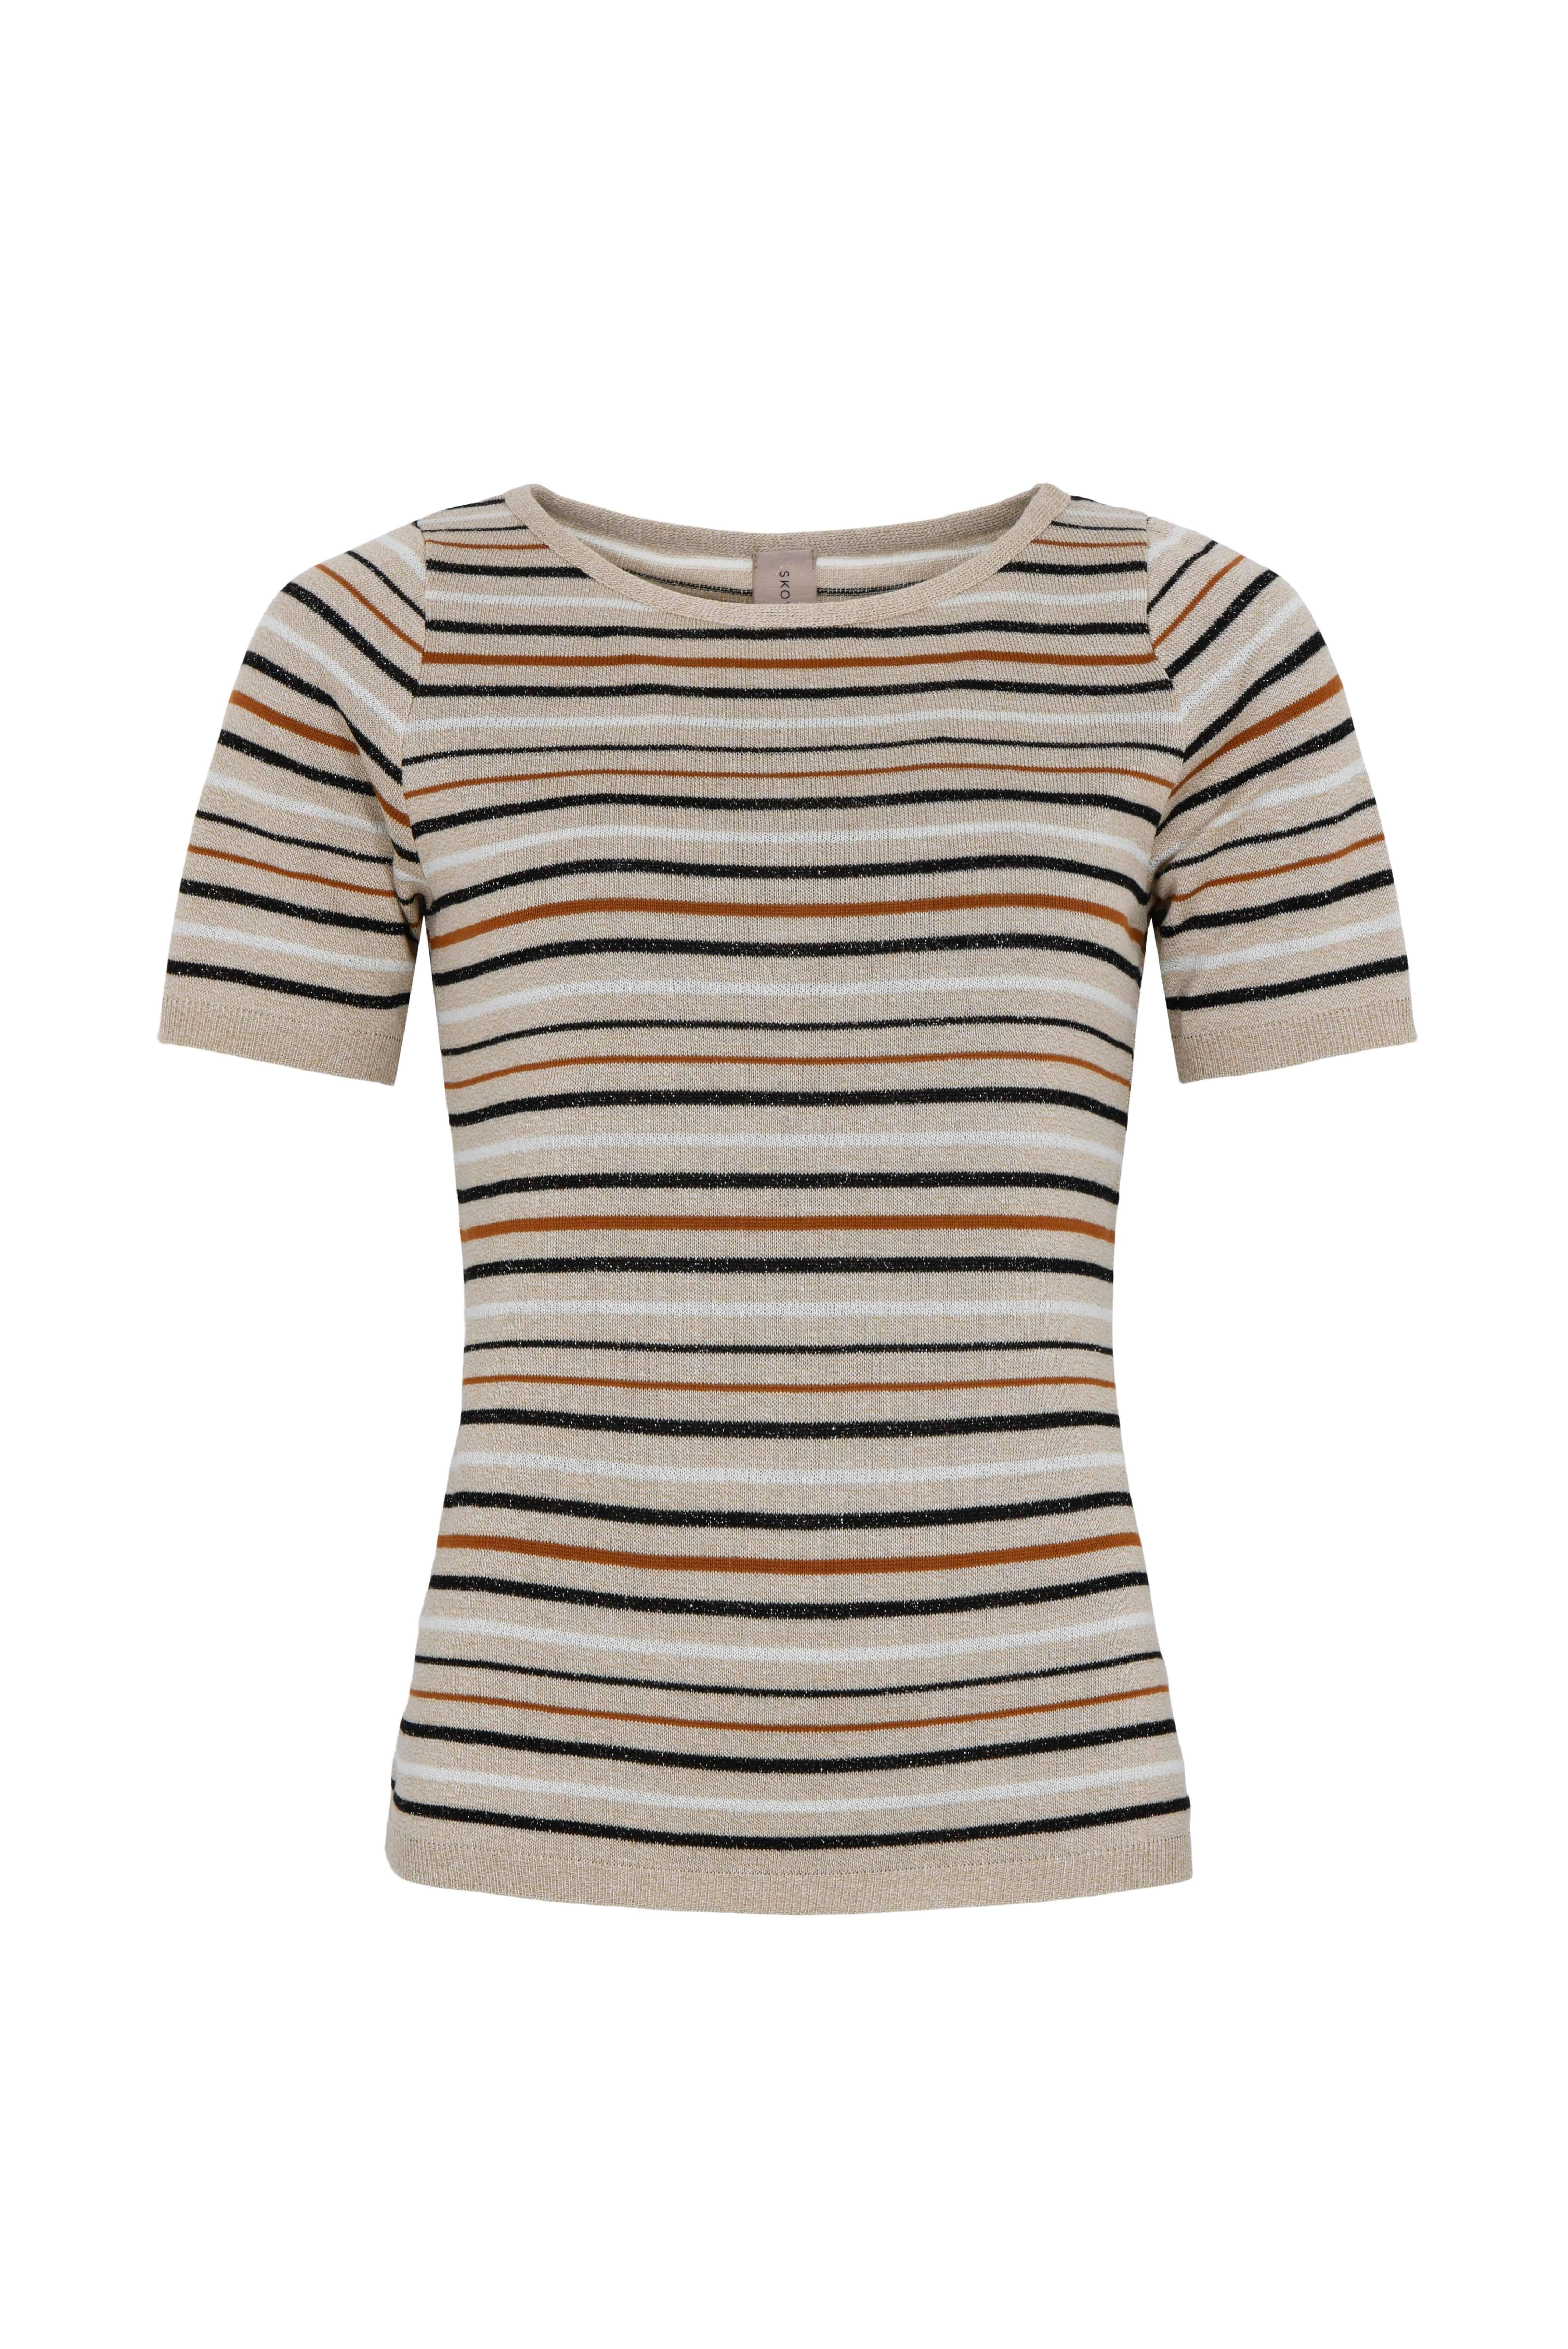 SKOVHUUS – T-shirts i strik